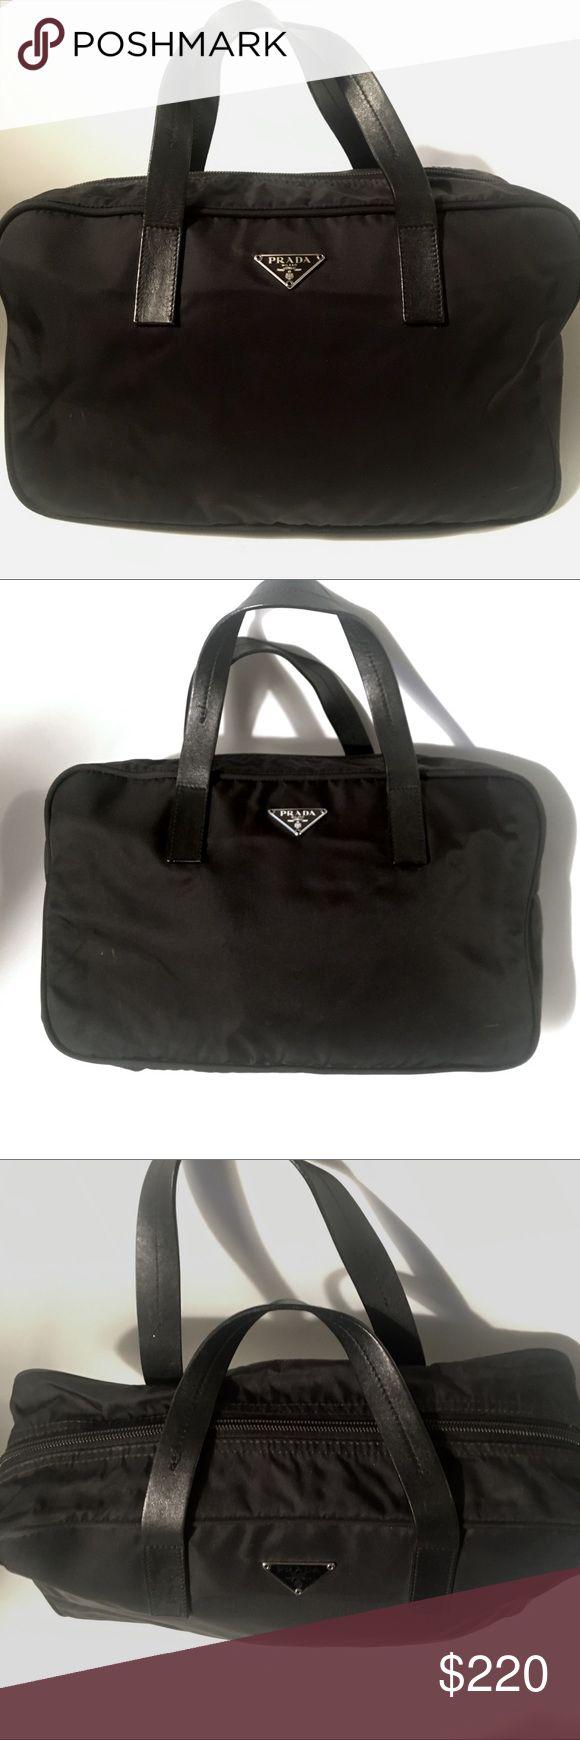 "Black Nylon Prada handbag Black nylon Prada satchel, in great condition, used slightly. No flaws. Originally bought at off Saks. any questions please ask. Measures: L:13""  H:8"" Gusset Width:4.5"" strap drop:5"" Prada Bags"